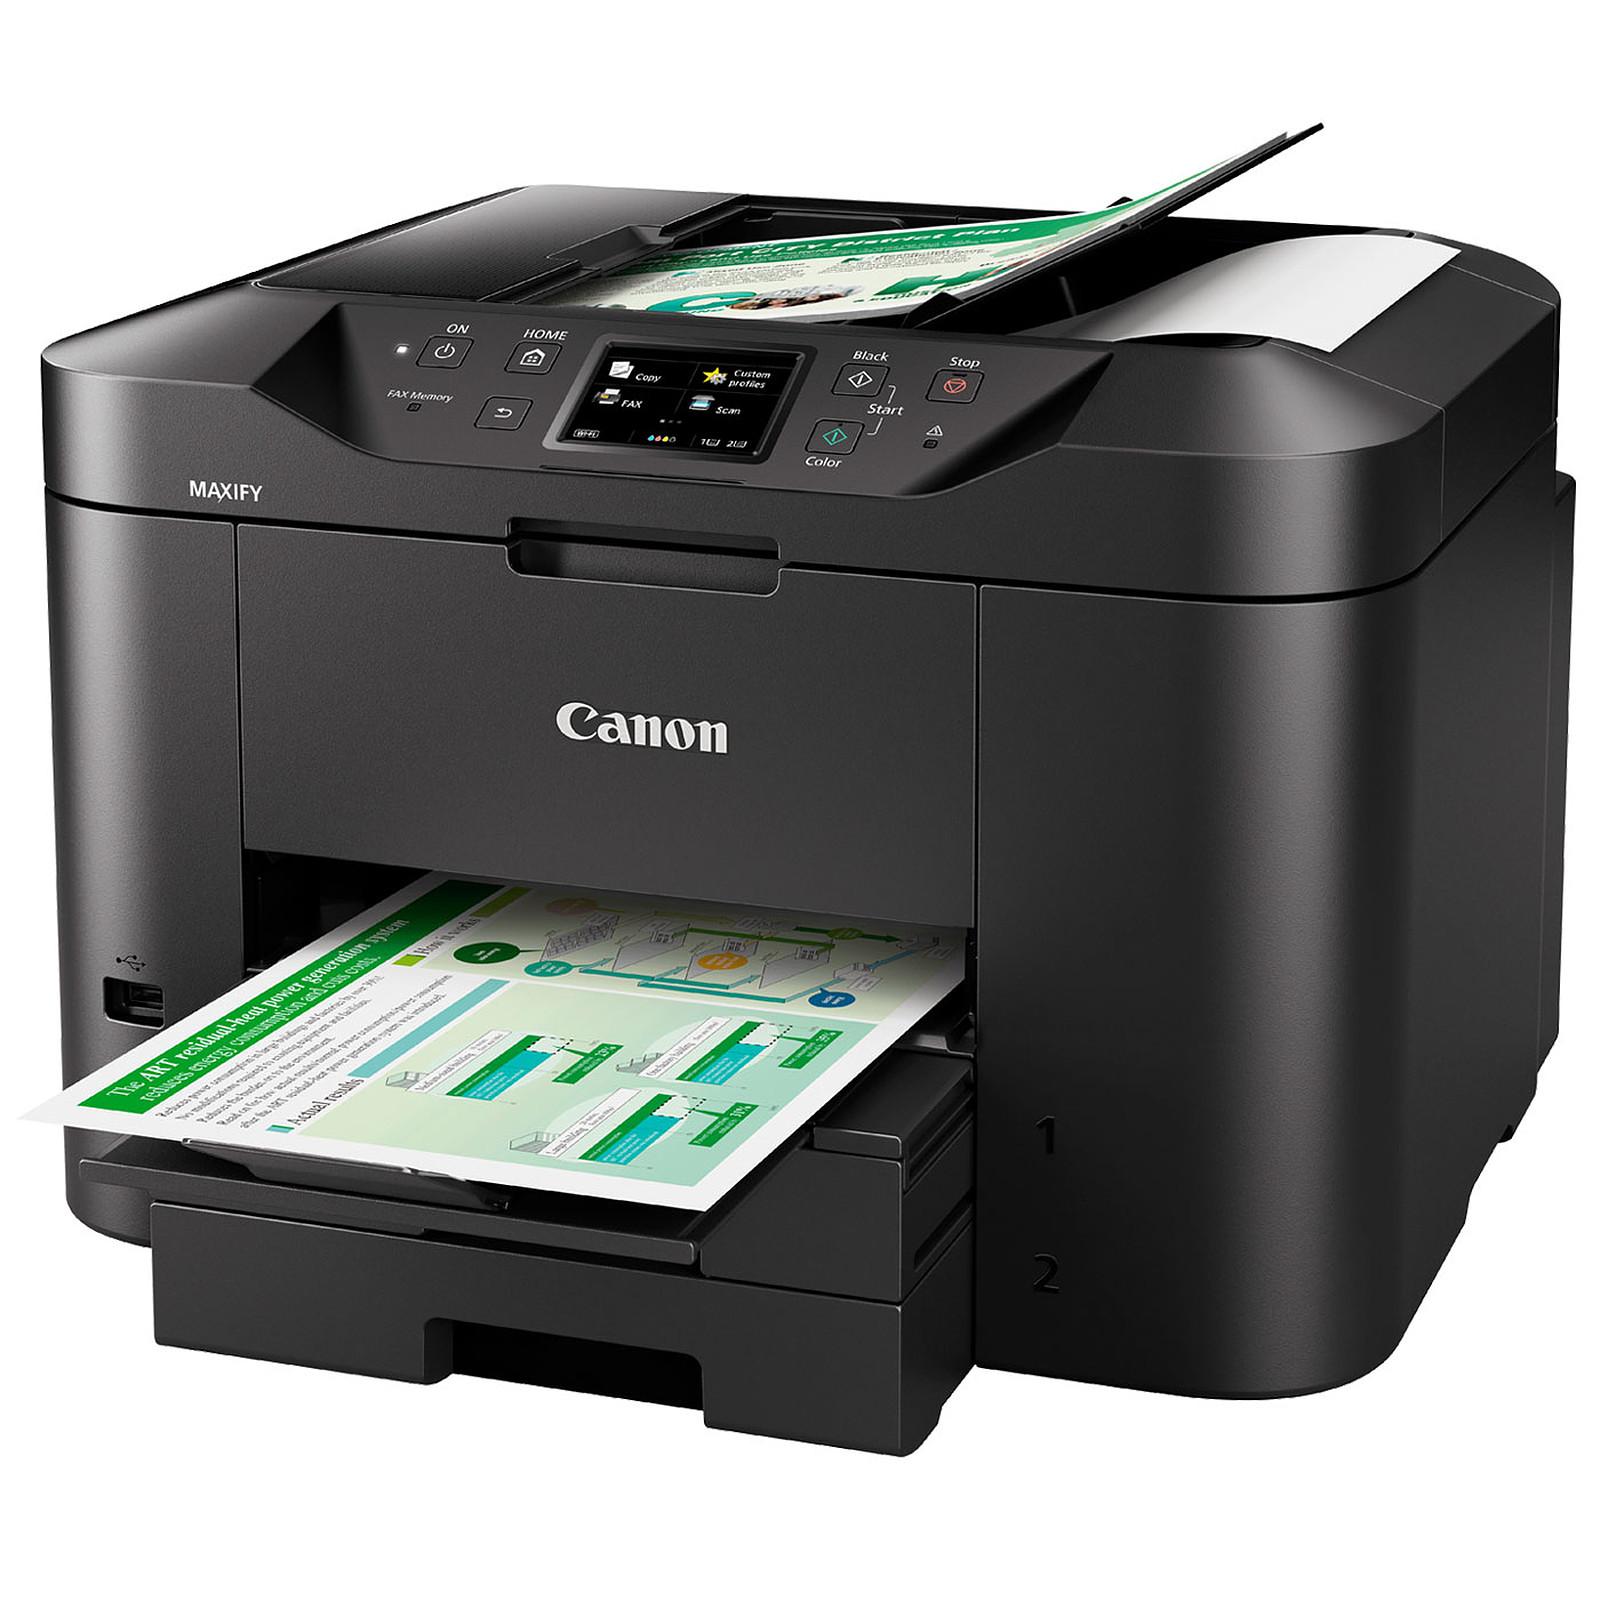 canon maxify mb2755 imprimante multifonction canon sur. Black Bedroom Furniture Sets. Home Design Ideas